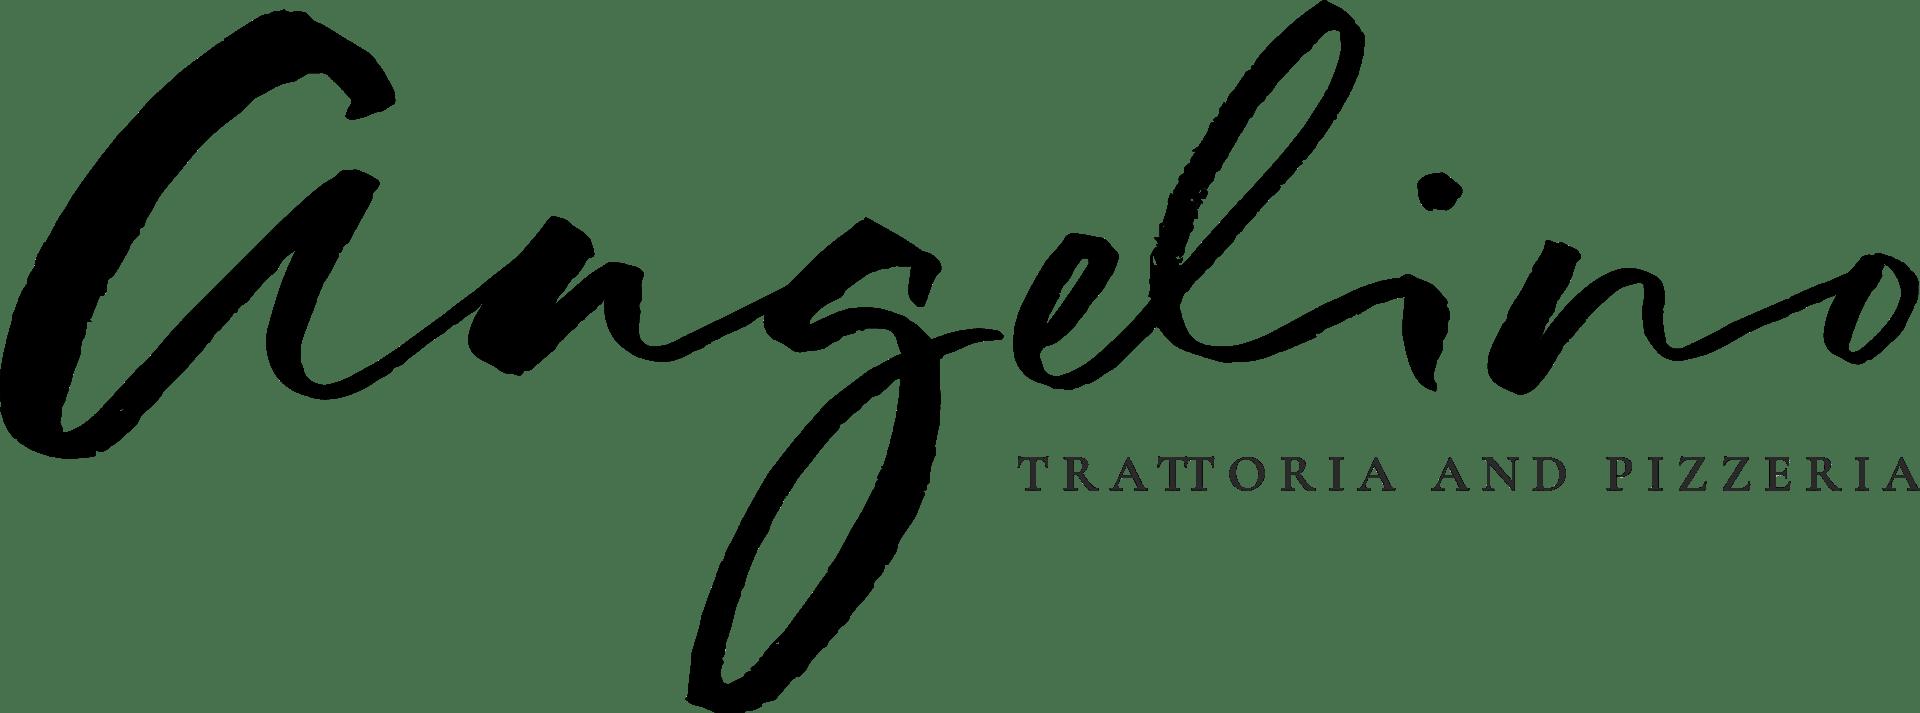 angelino logo